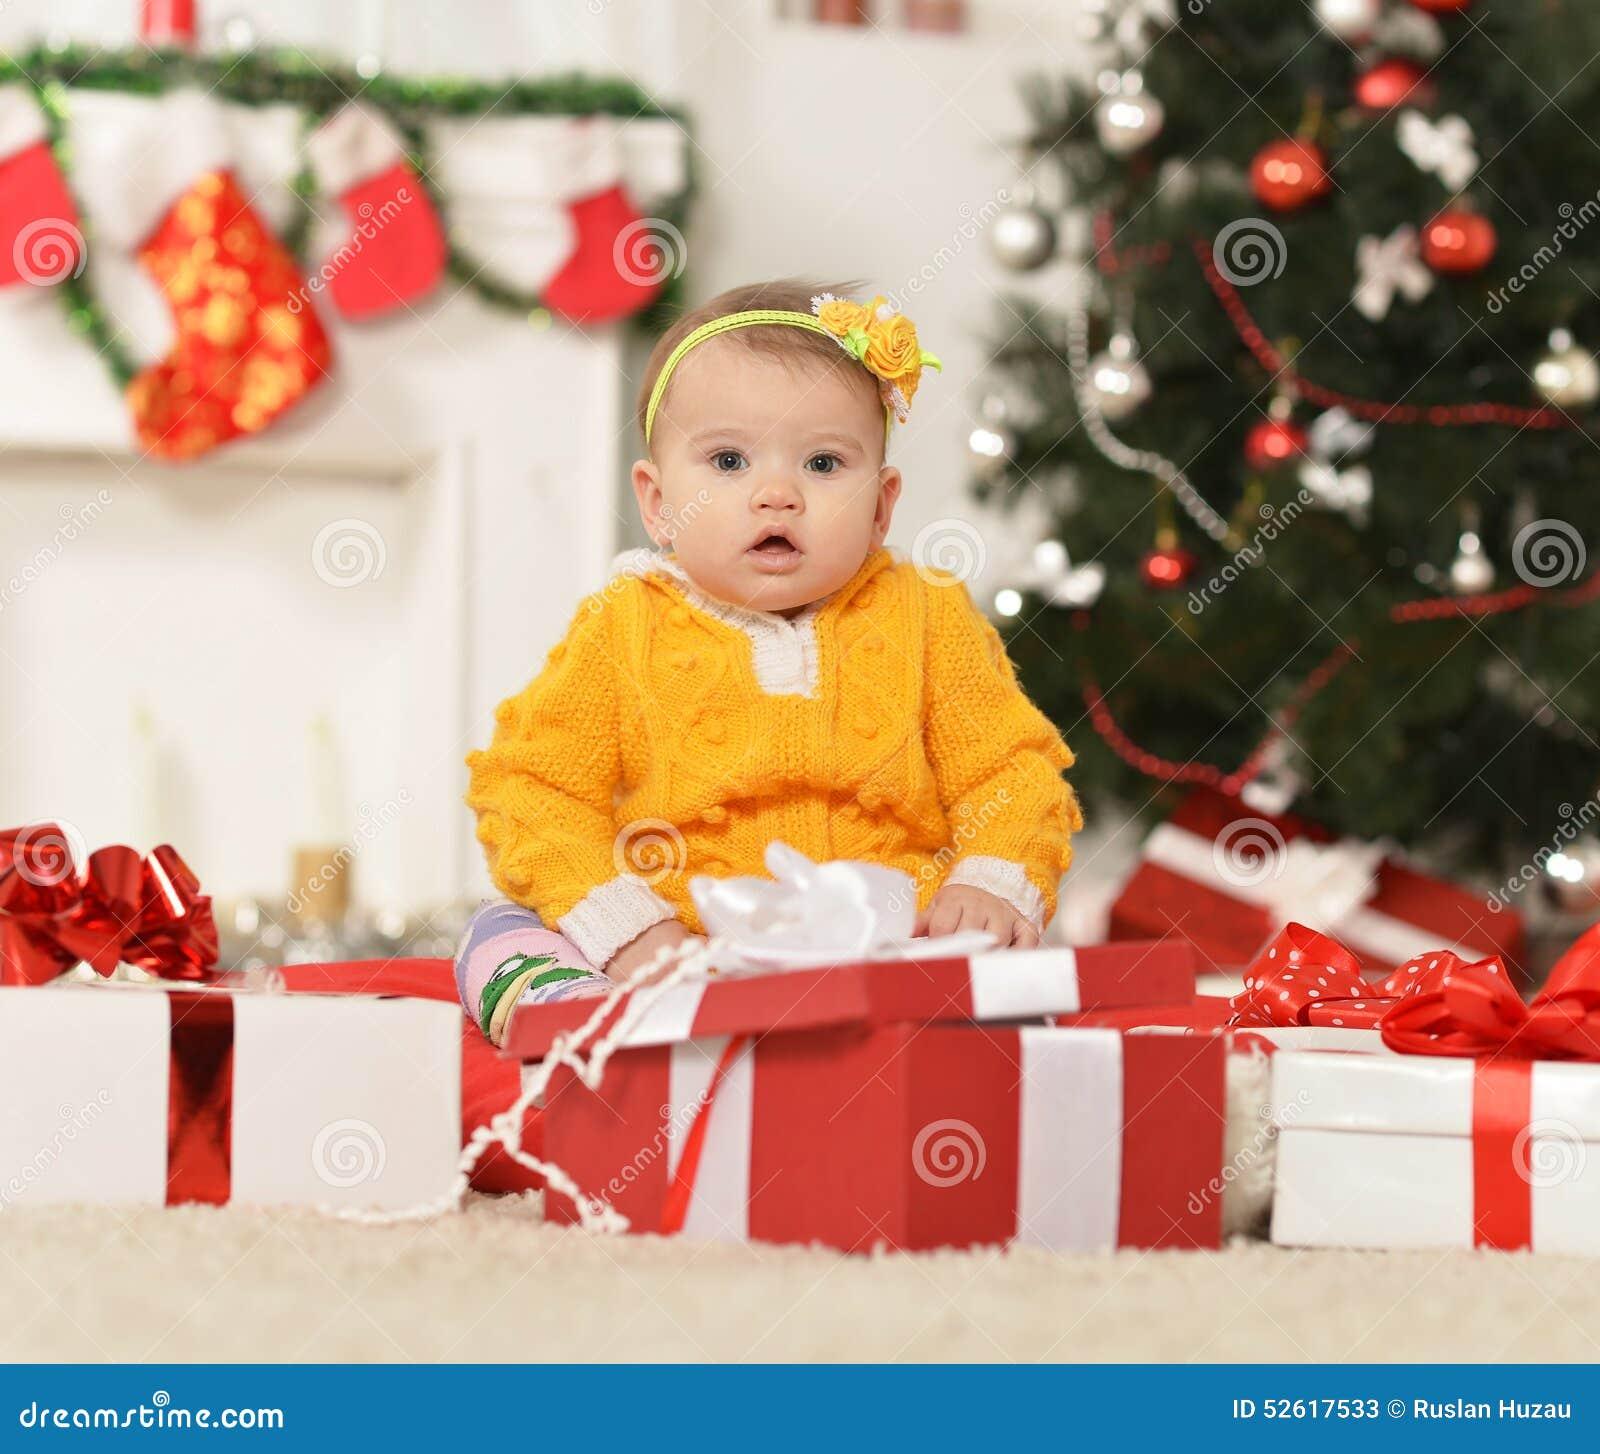 Cute Baby Gifts For Christmas : Girl near christmas tree stock photo image